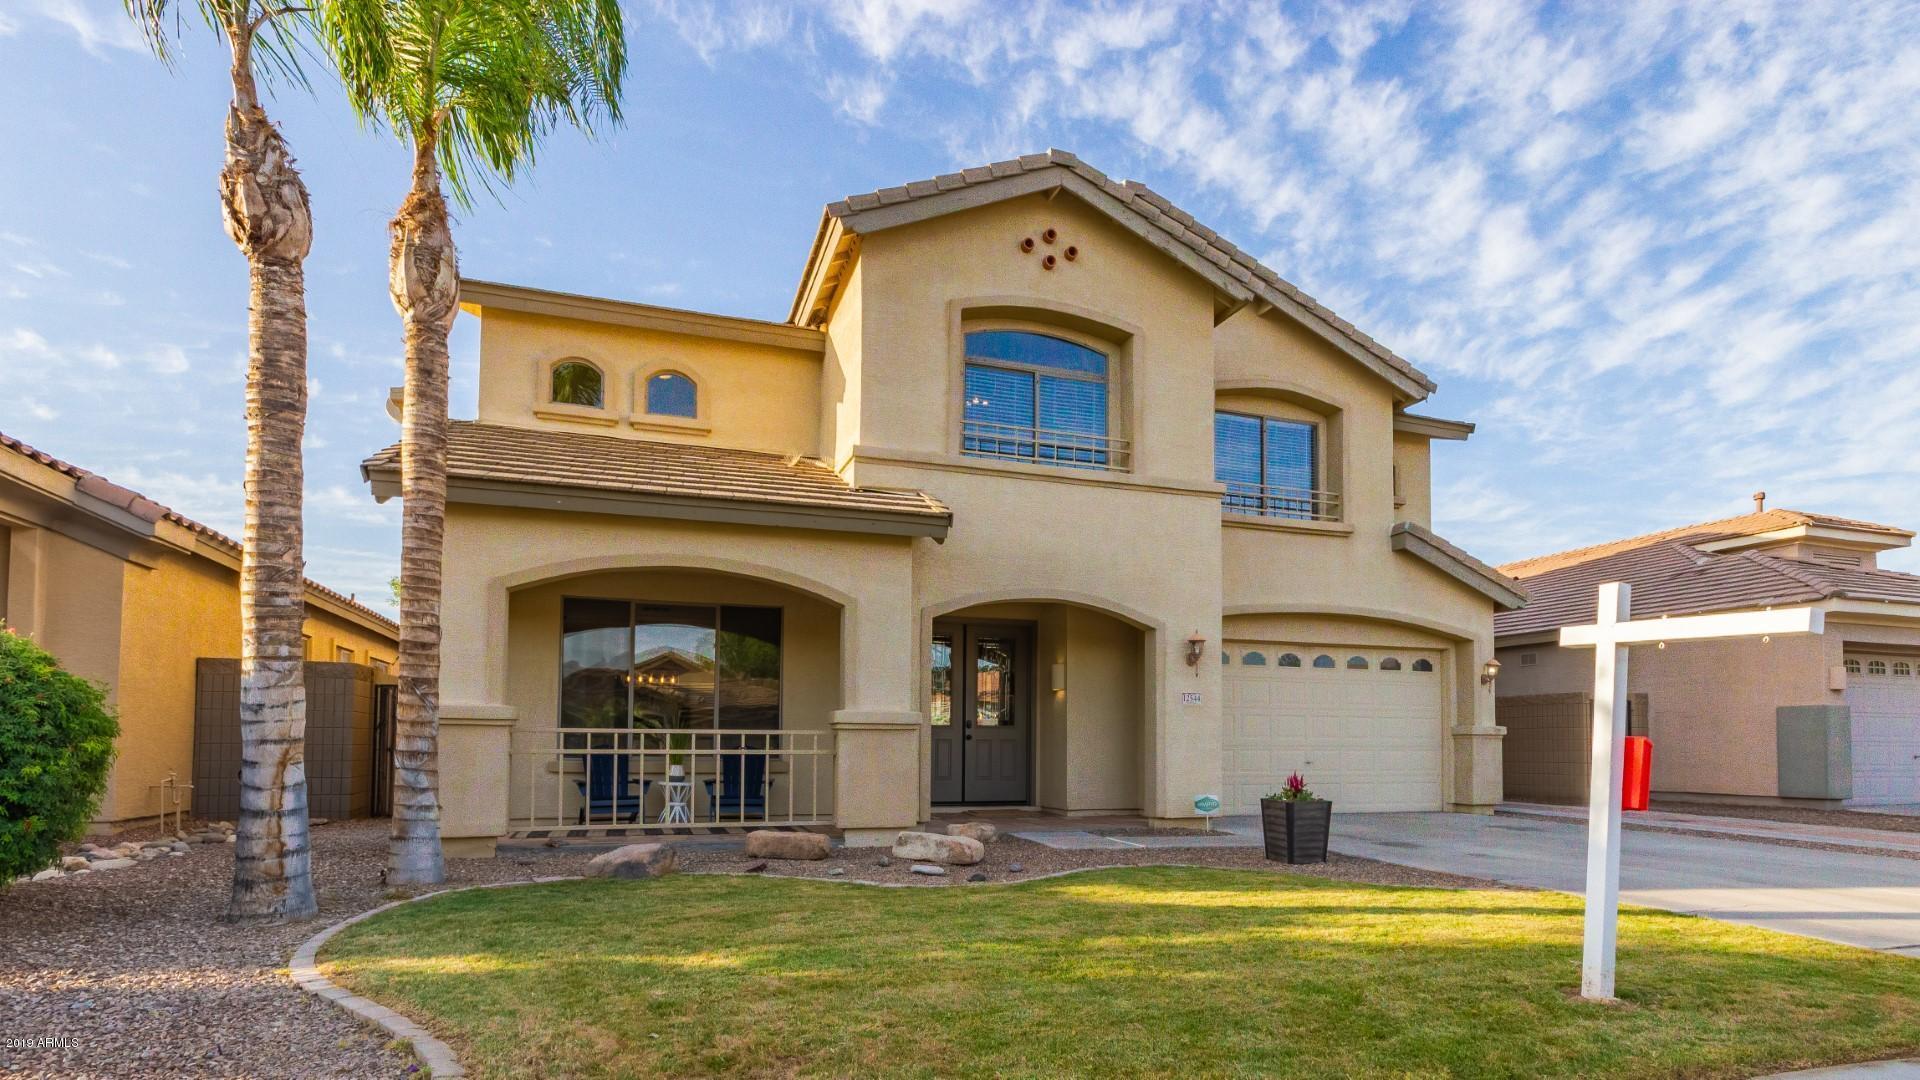 MLS 5928247 12544 W ALEGRE Drive, Litchfield Park, AZ 85340 Litchfield Park AZ Wigwam Creek